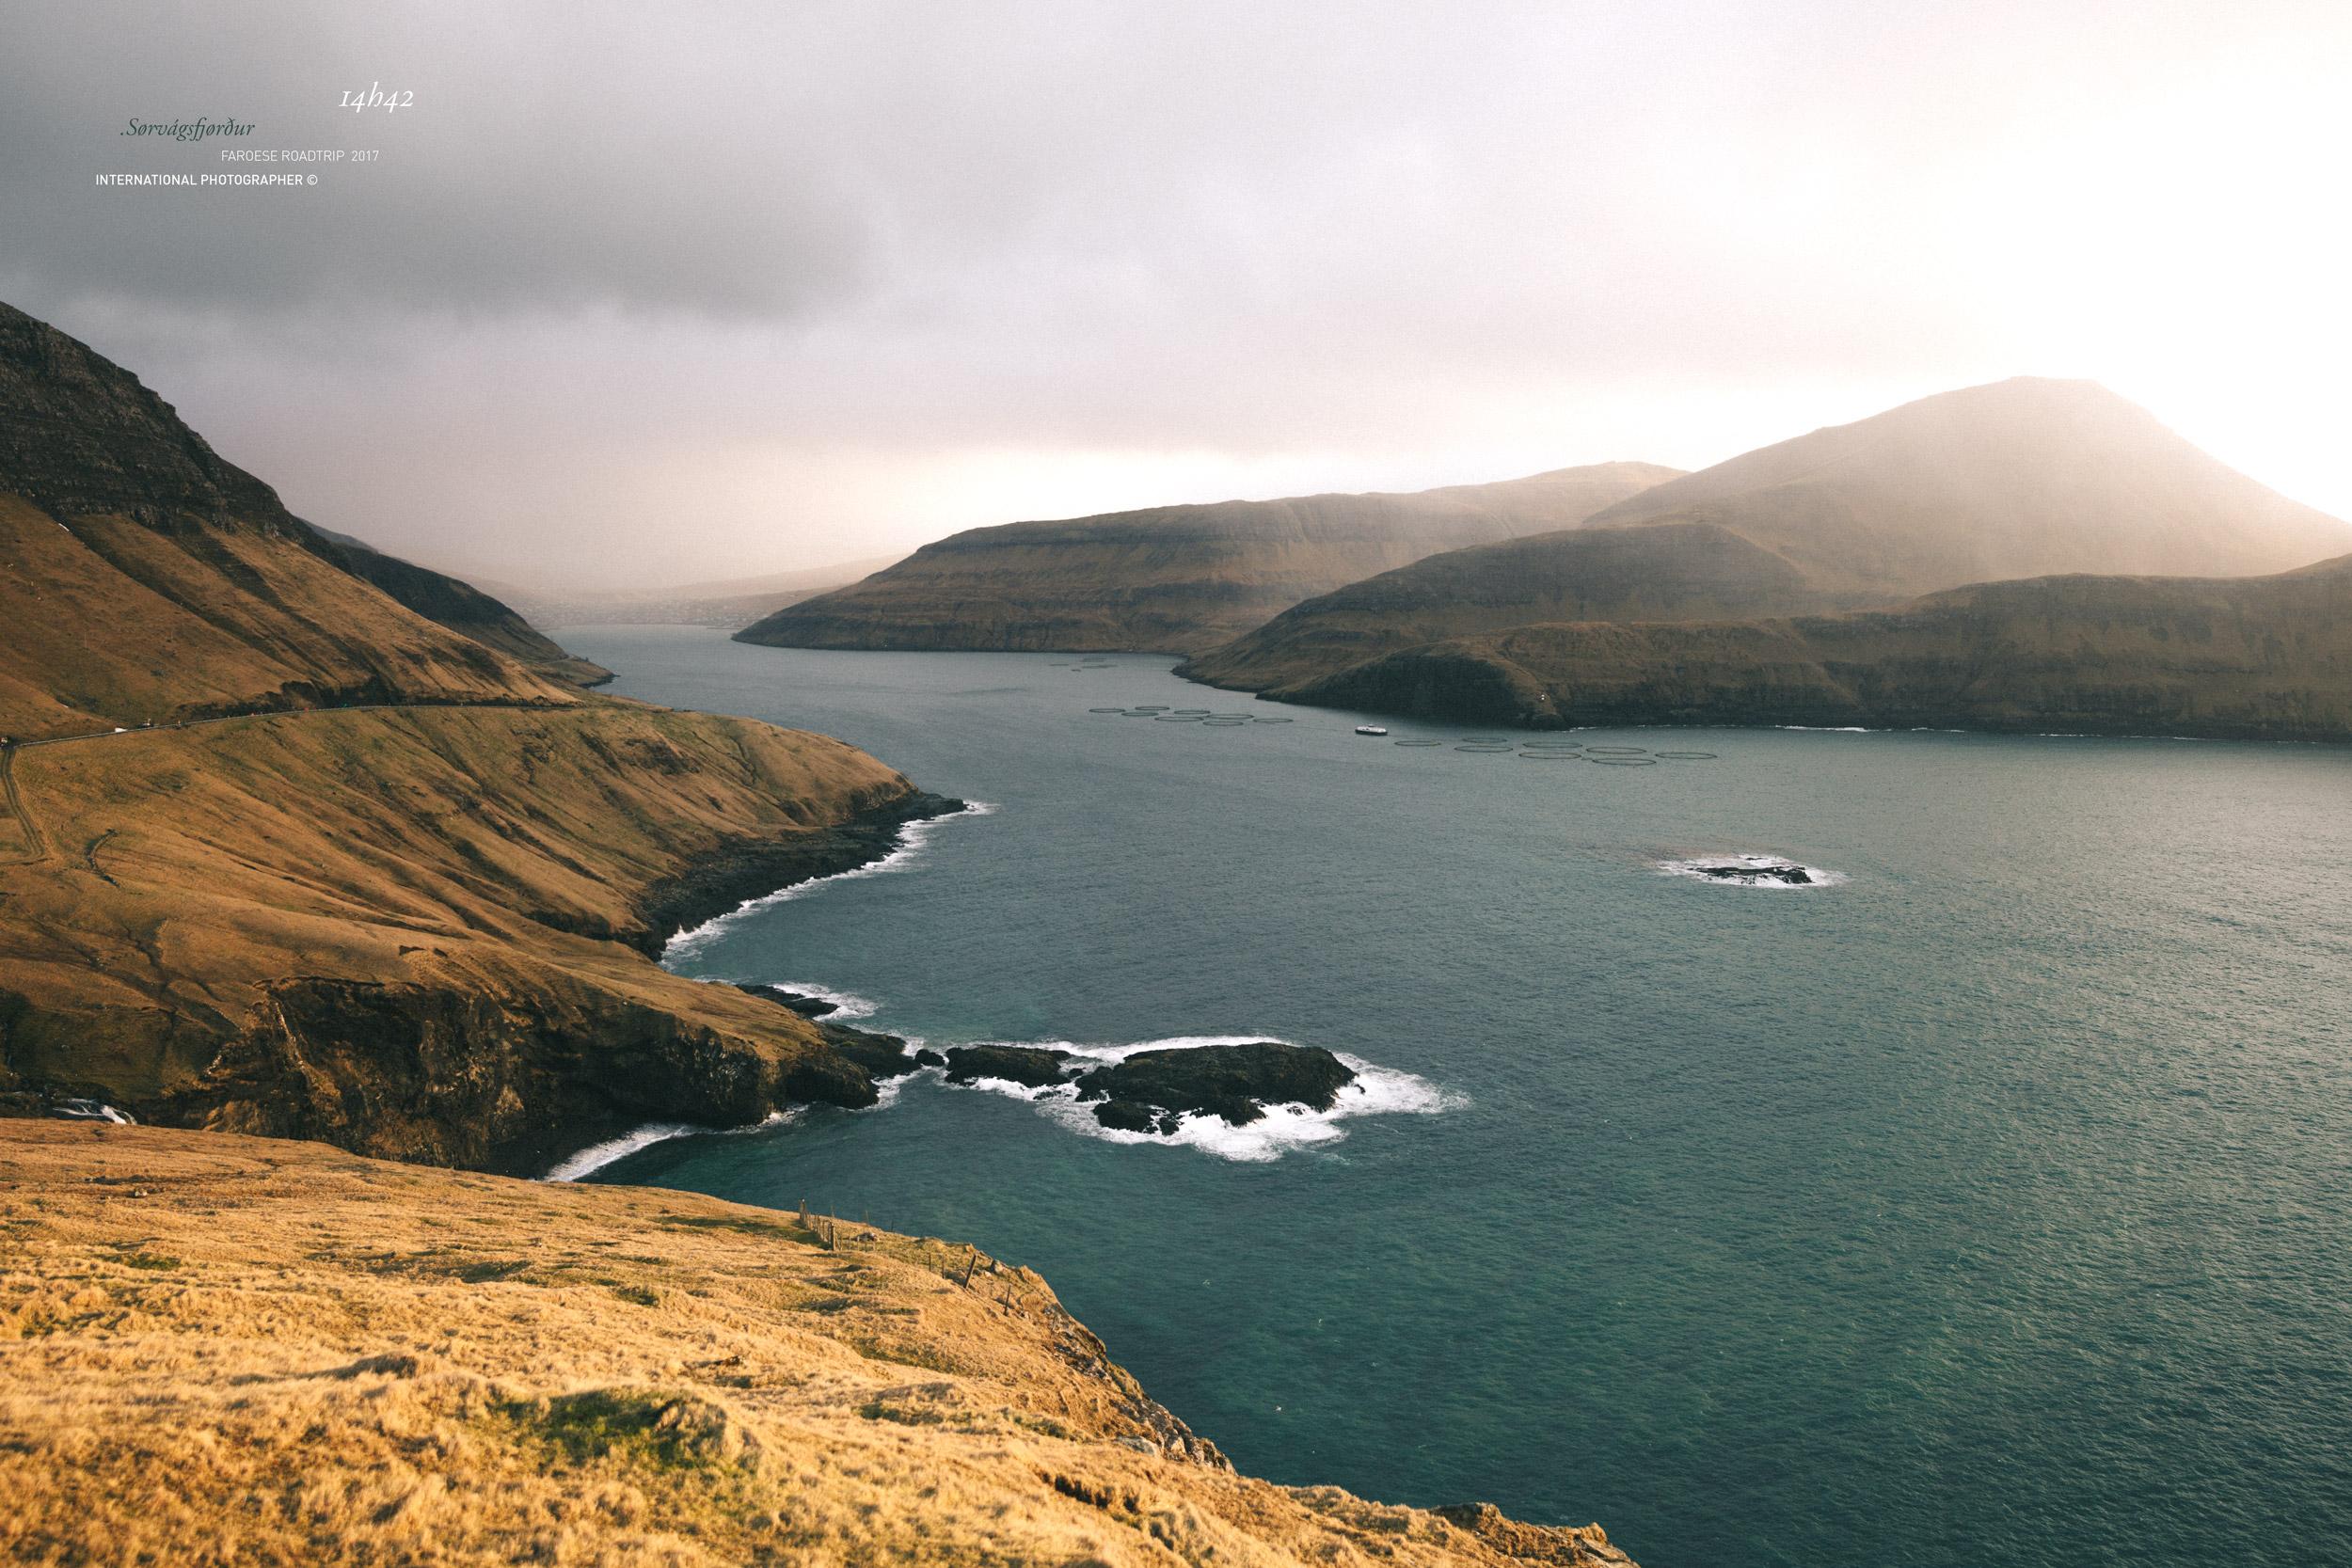 Vue sur le fjord Sørvágsfjørður